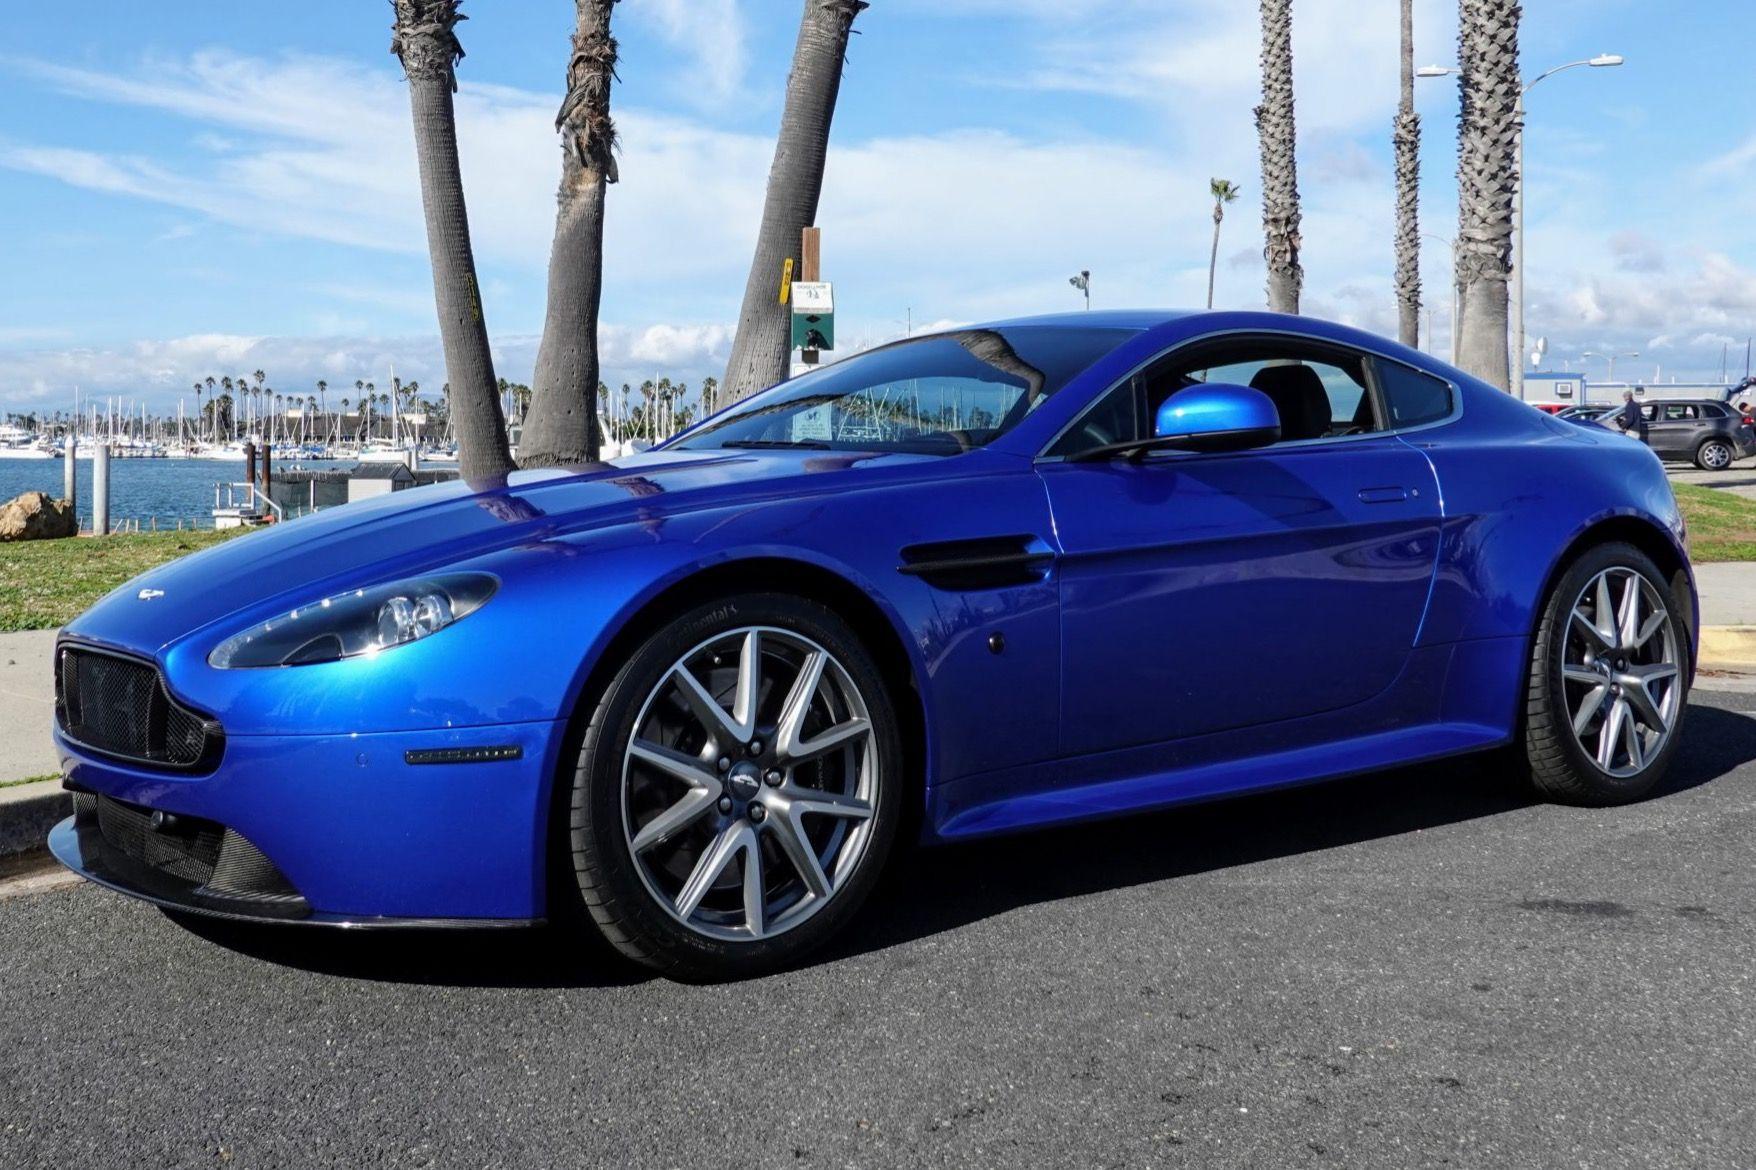 2012 Aston Martin V8 Vantage S Vin Scfekbdl9cgc16123 Classic Com